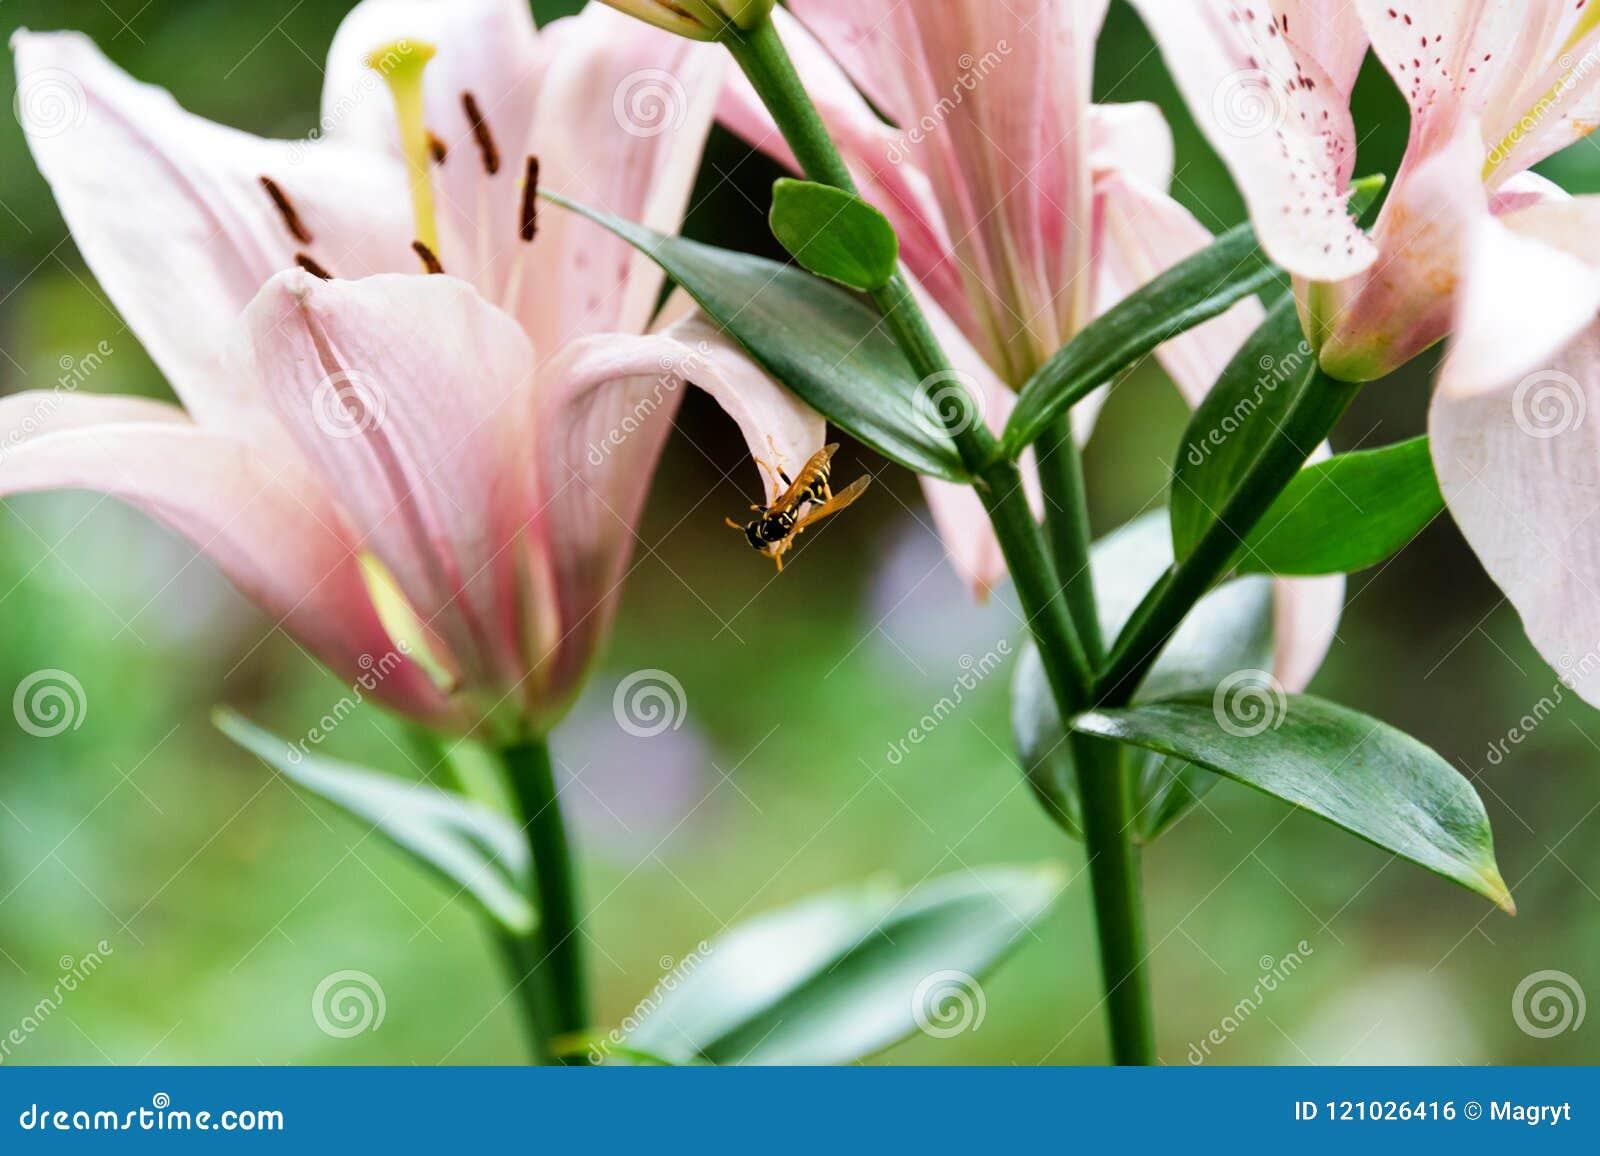 Beautiful lily flowers on green leaves background wasp sits on the beautiful lily flowers on green leaves background wasp sits on the flower lilium longiflorum izmirmasajfo